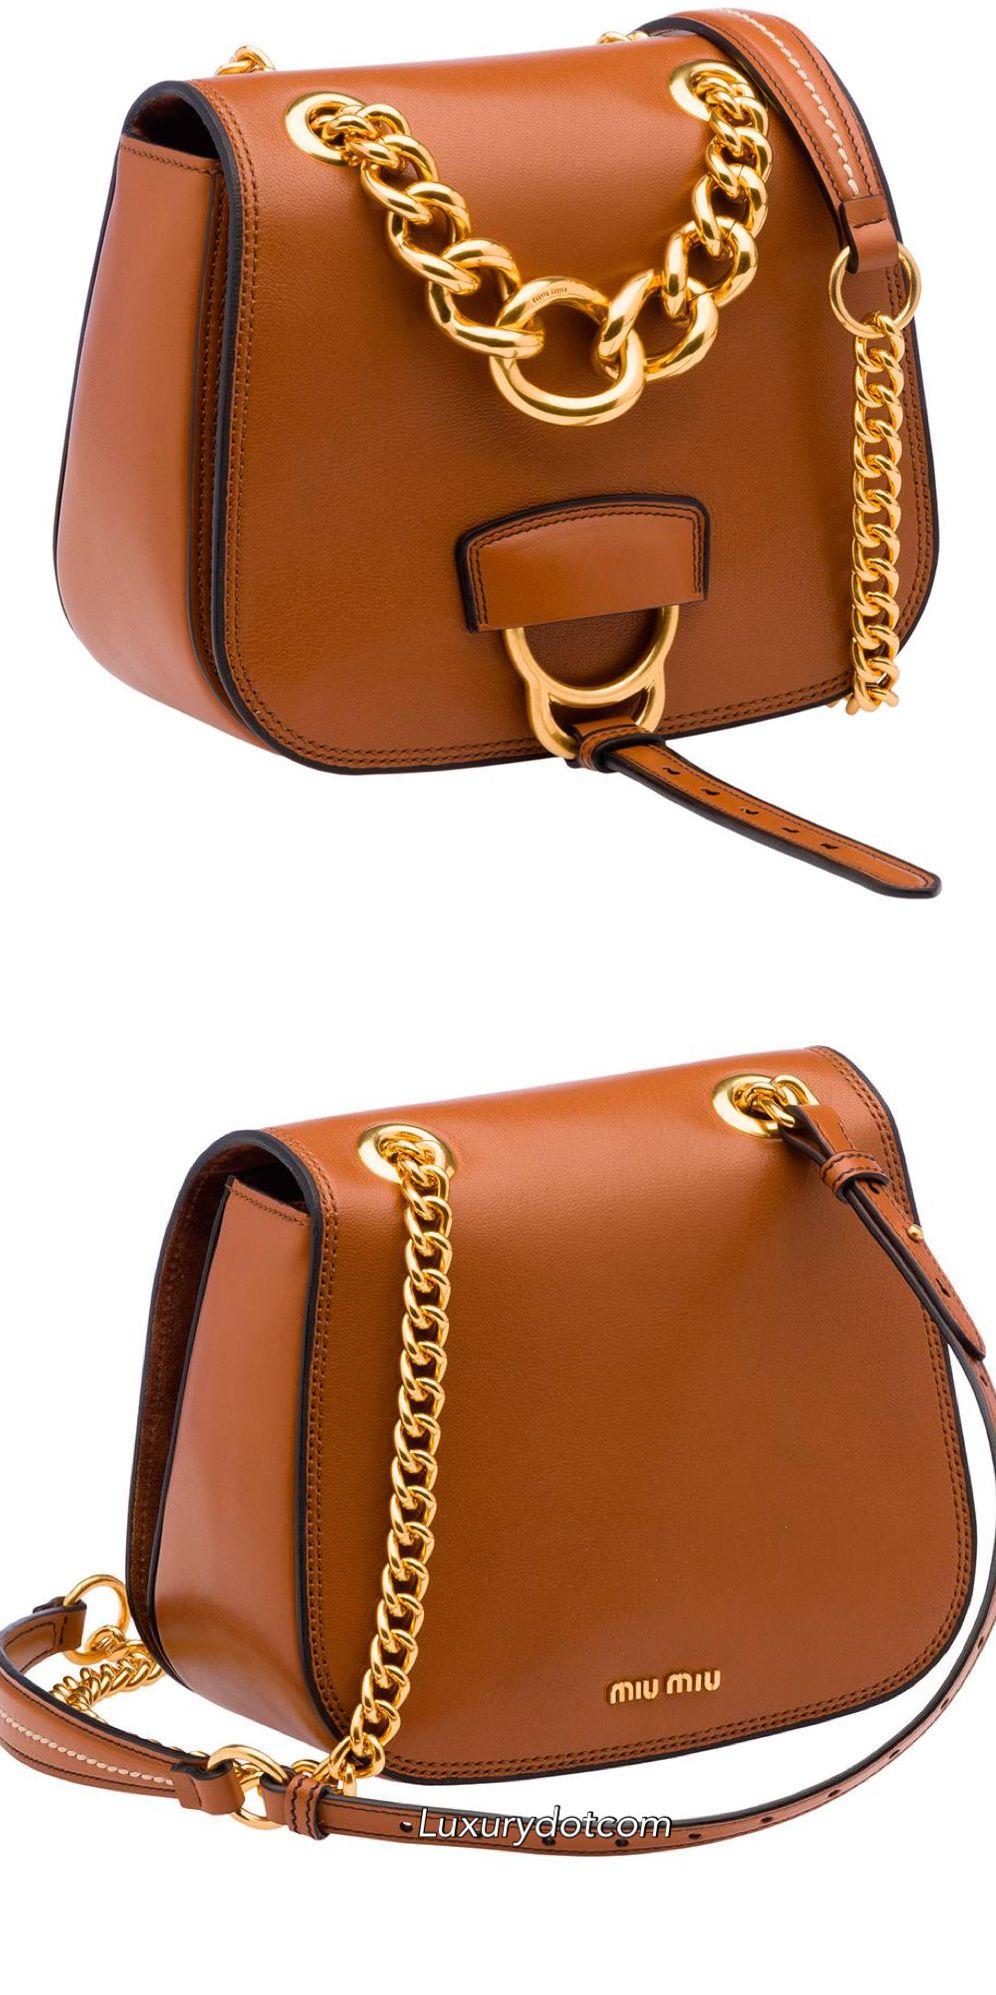 Miumiu Tan Leather 2017 Luxurydotcom Miu Tasche Purses And Handbags